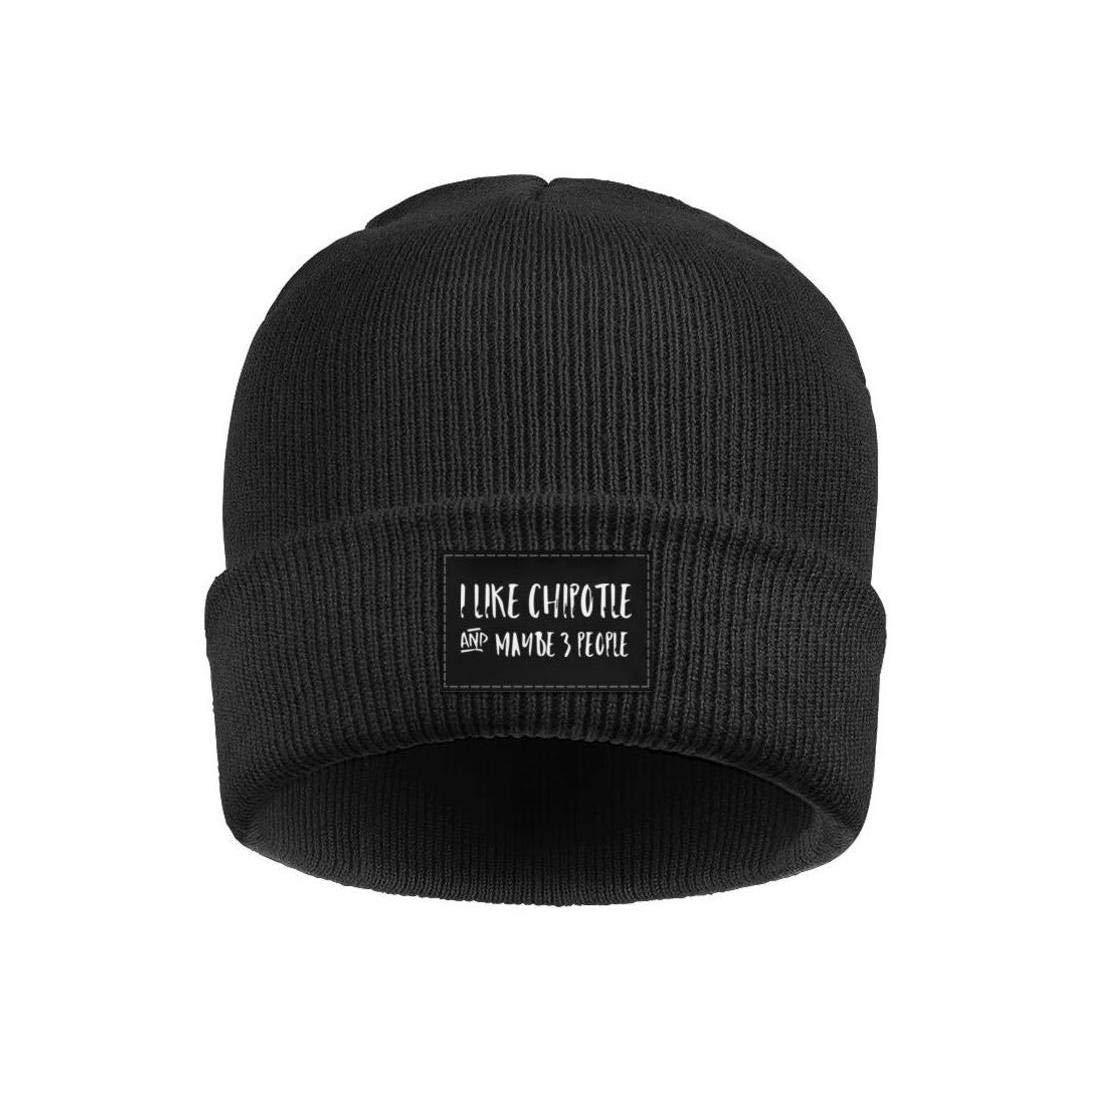 1ba9827f88d ftuyuy erett Sports Men Beanie Hats I-Like-Chipotle- Ski Warm Knit Cap at  Amazon Men s Clothing store